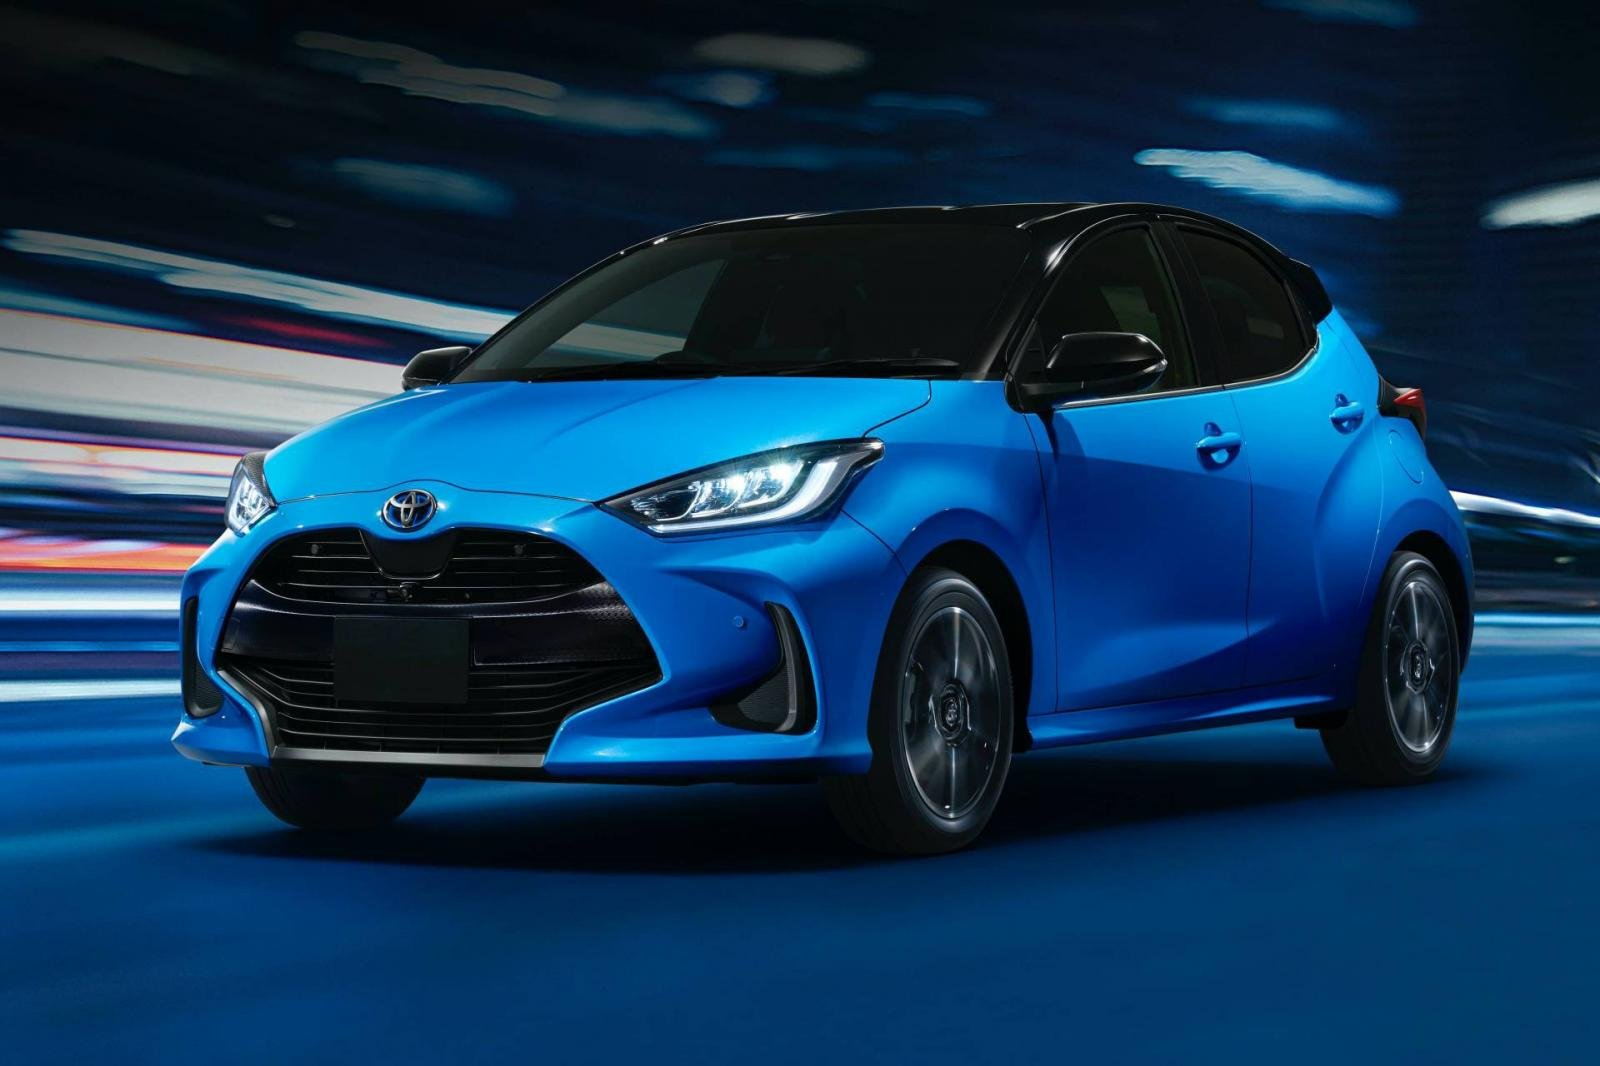 Ngoại thất xe Toyota Yaris 2020